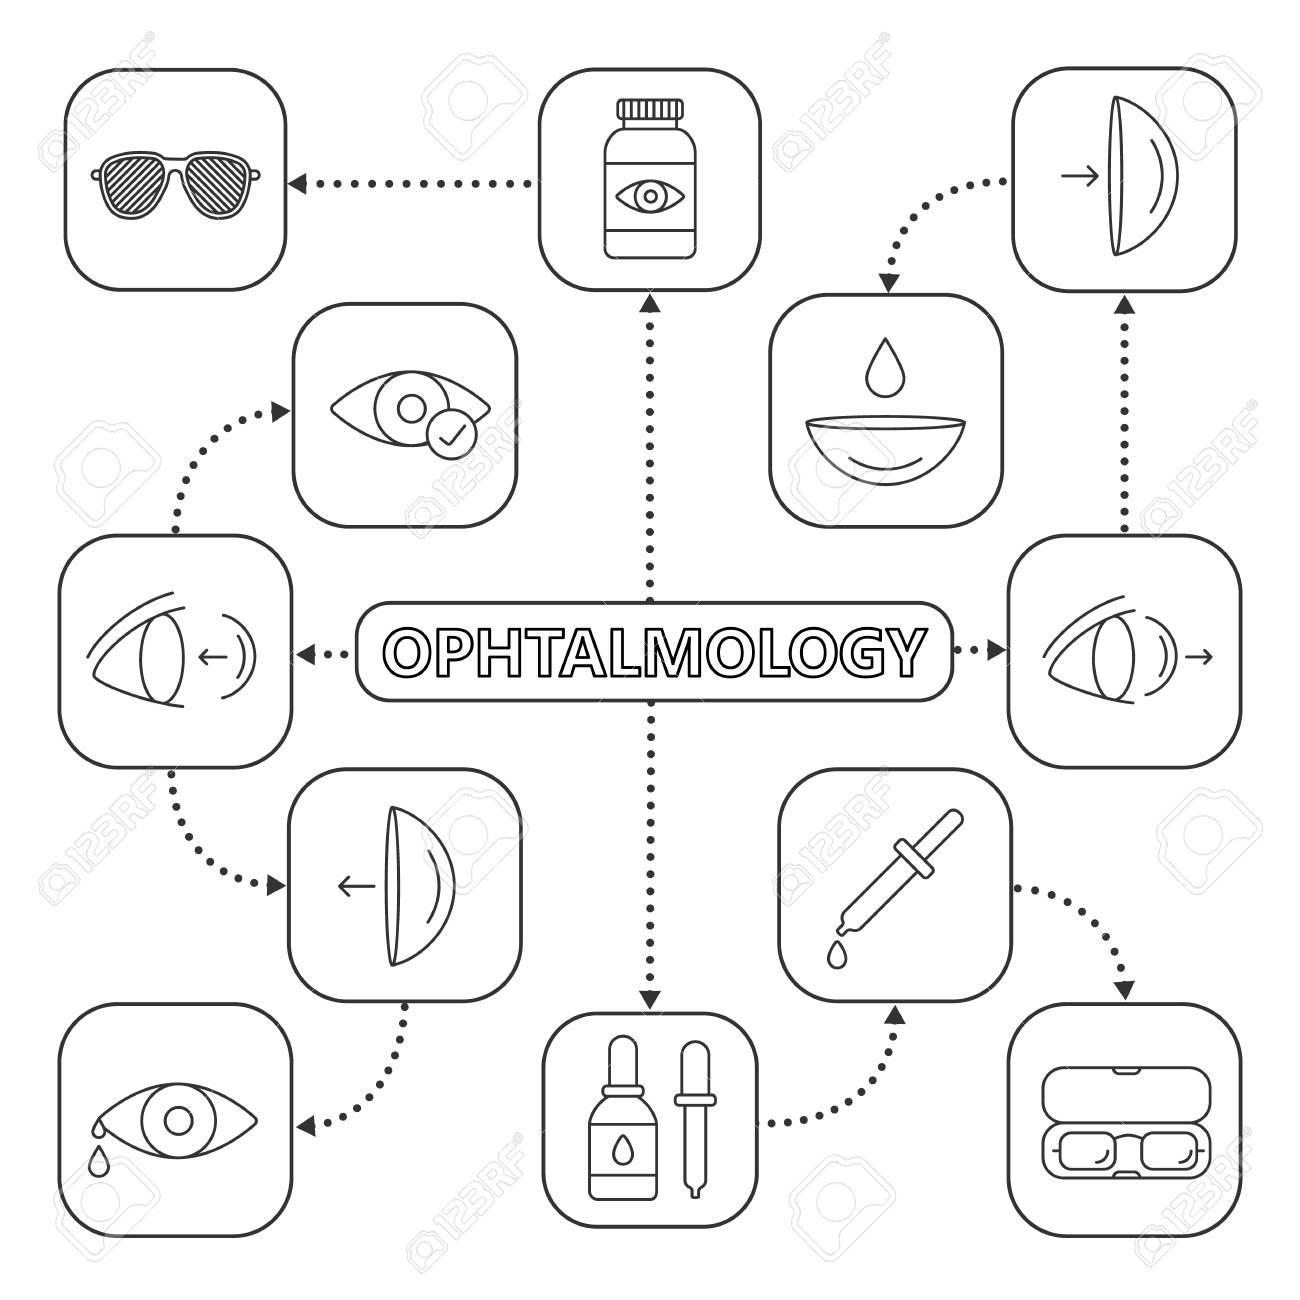 Mindmaps In Ophthalmology Polygo Minie Mouse By Sentinel Mind Map Array Rh Elzplorers De